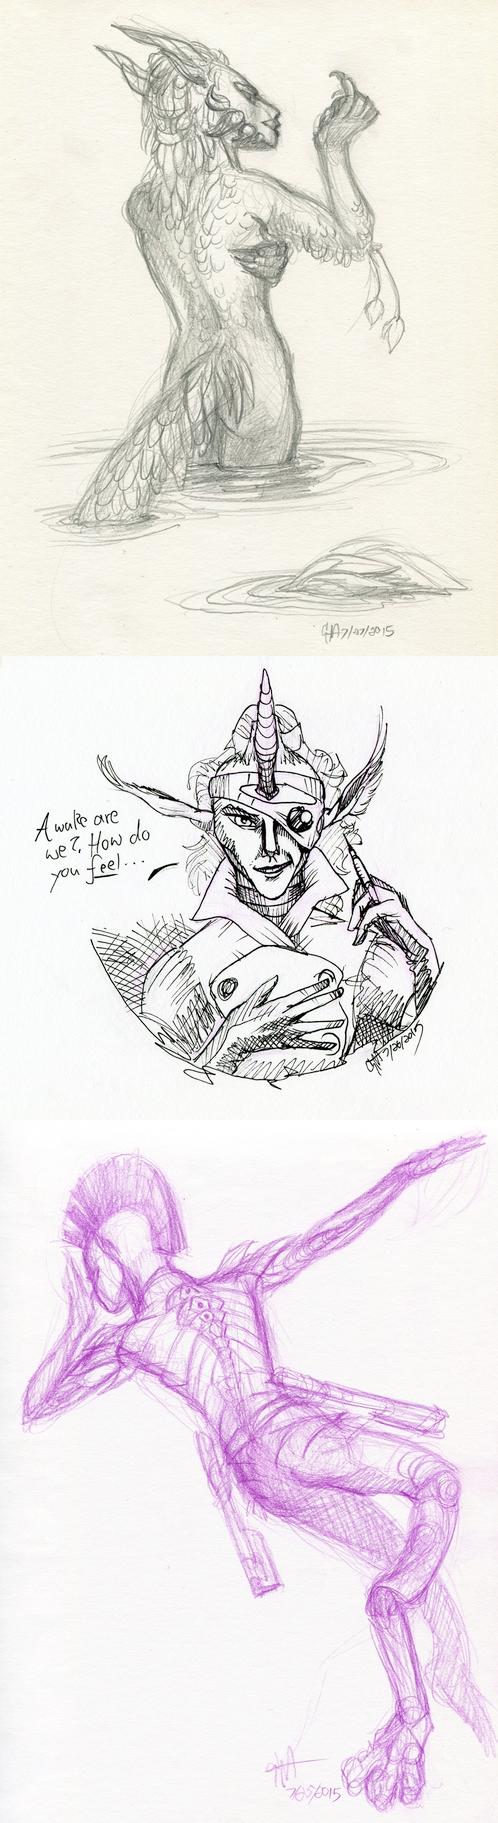 Femme Fatale sketches pg. 1